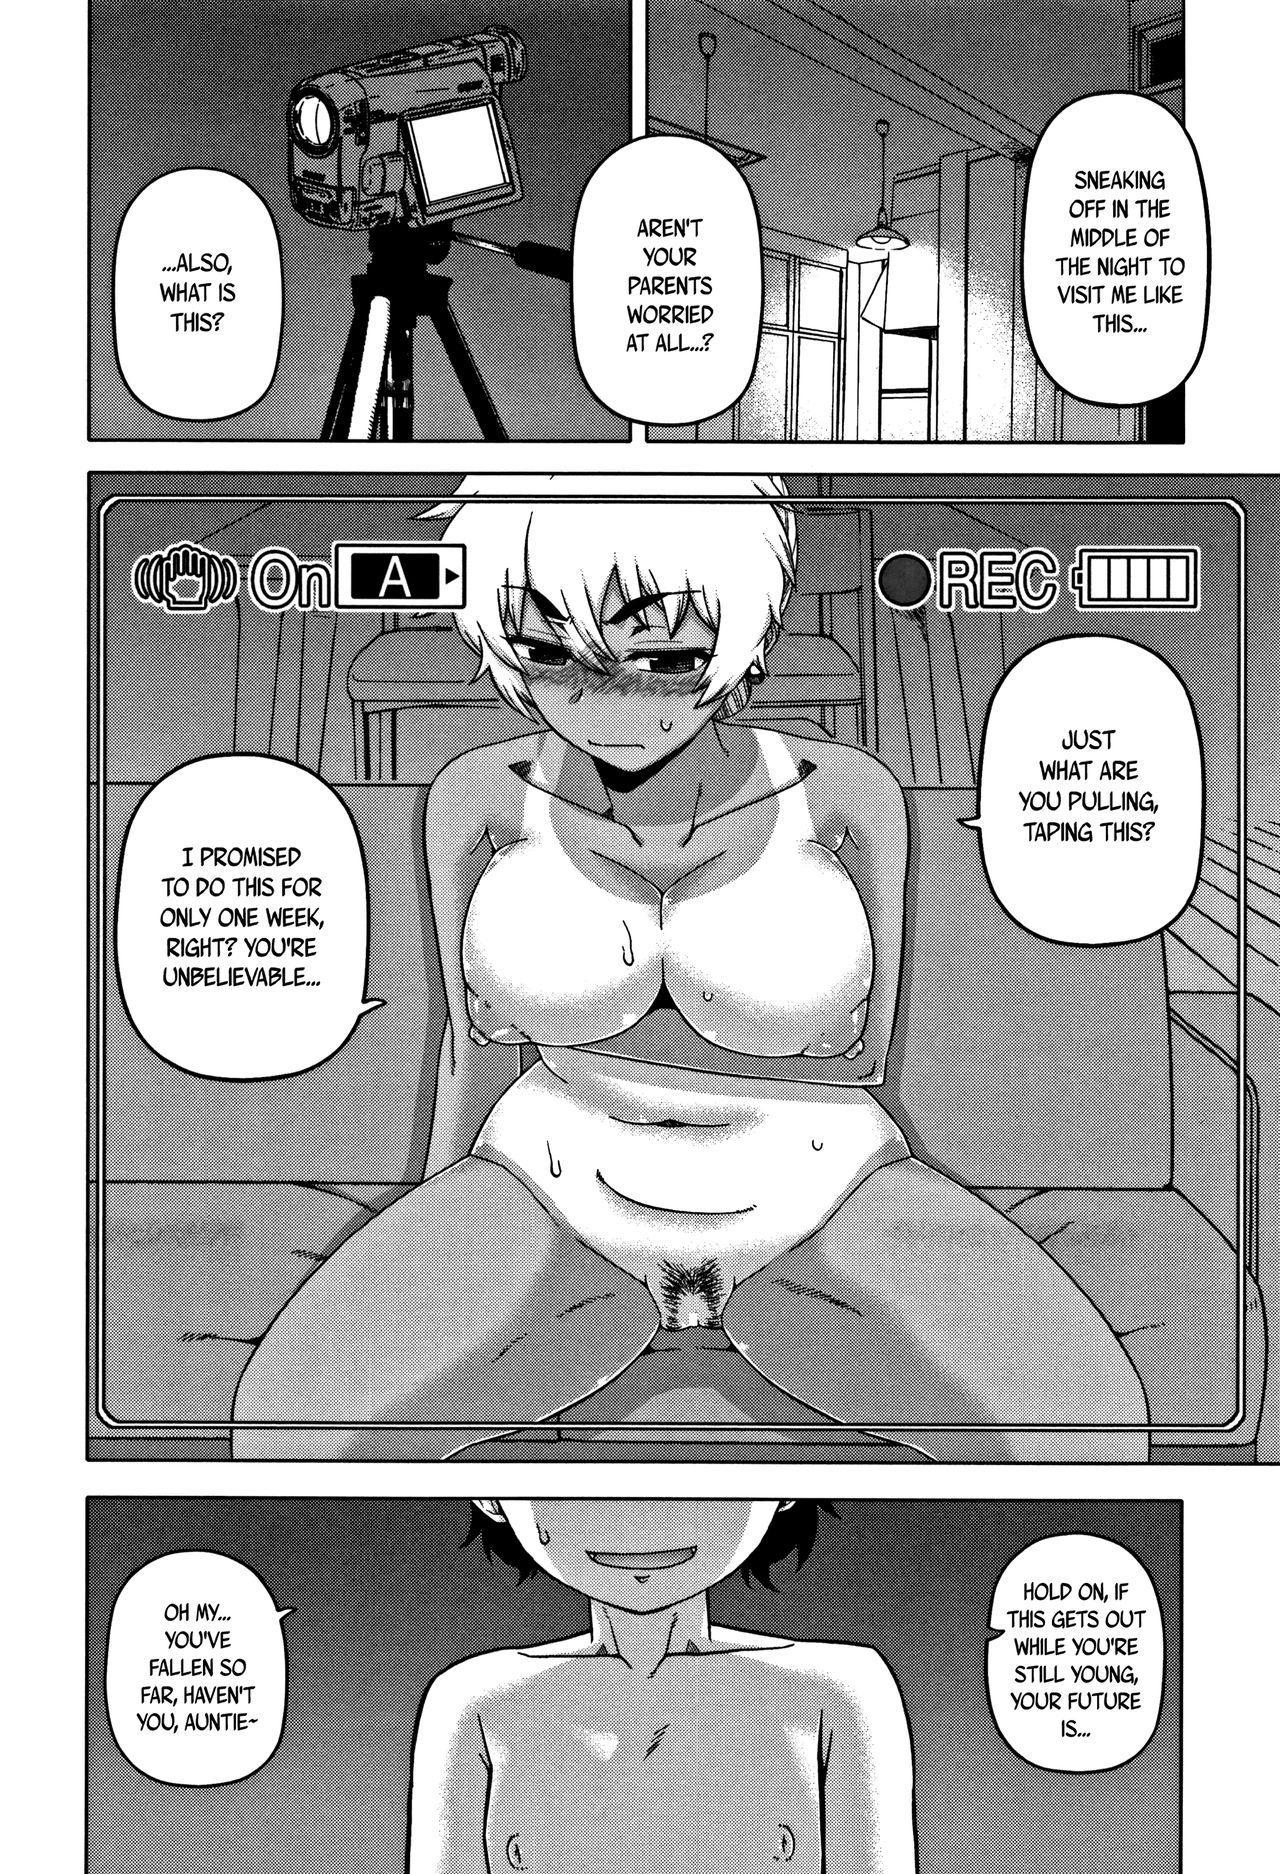 [Takatsu] Hitozuma A-san to Musuko no Yuujin N-kun - Married wife A and son's friend N-kun [English] 29